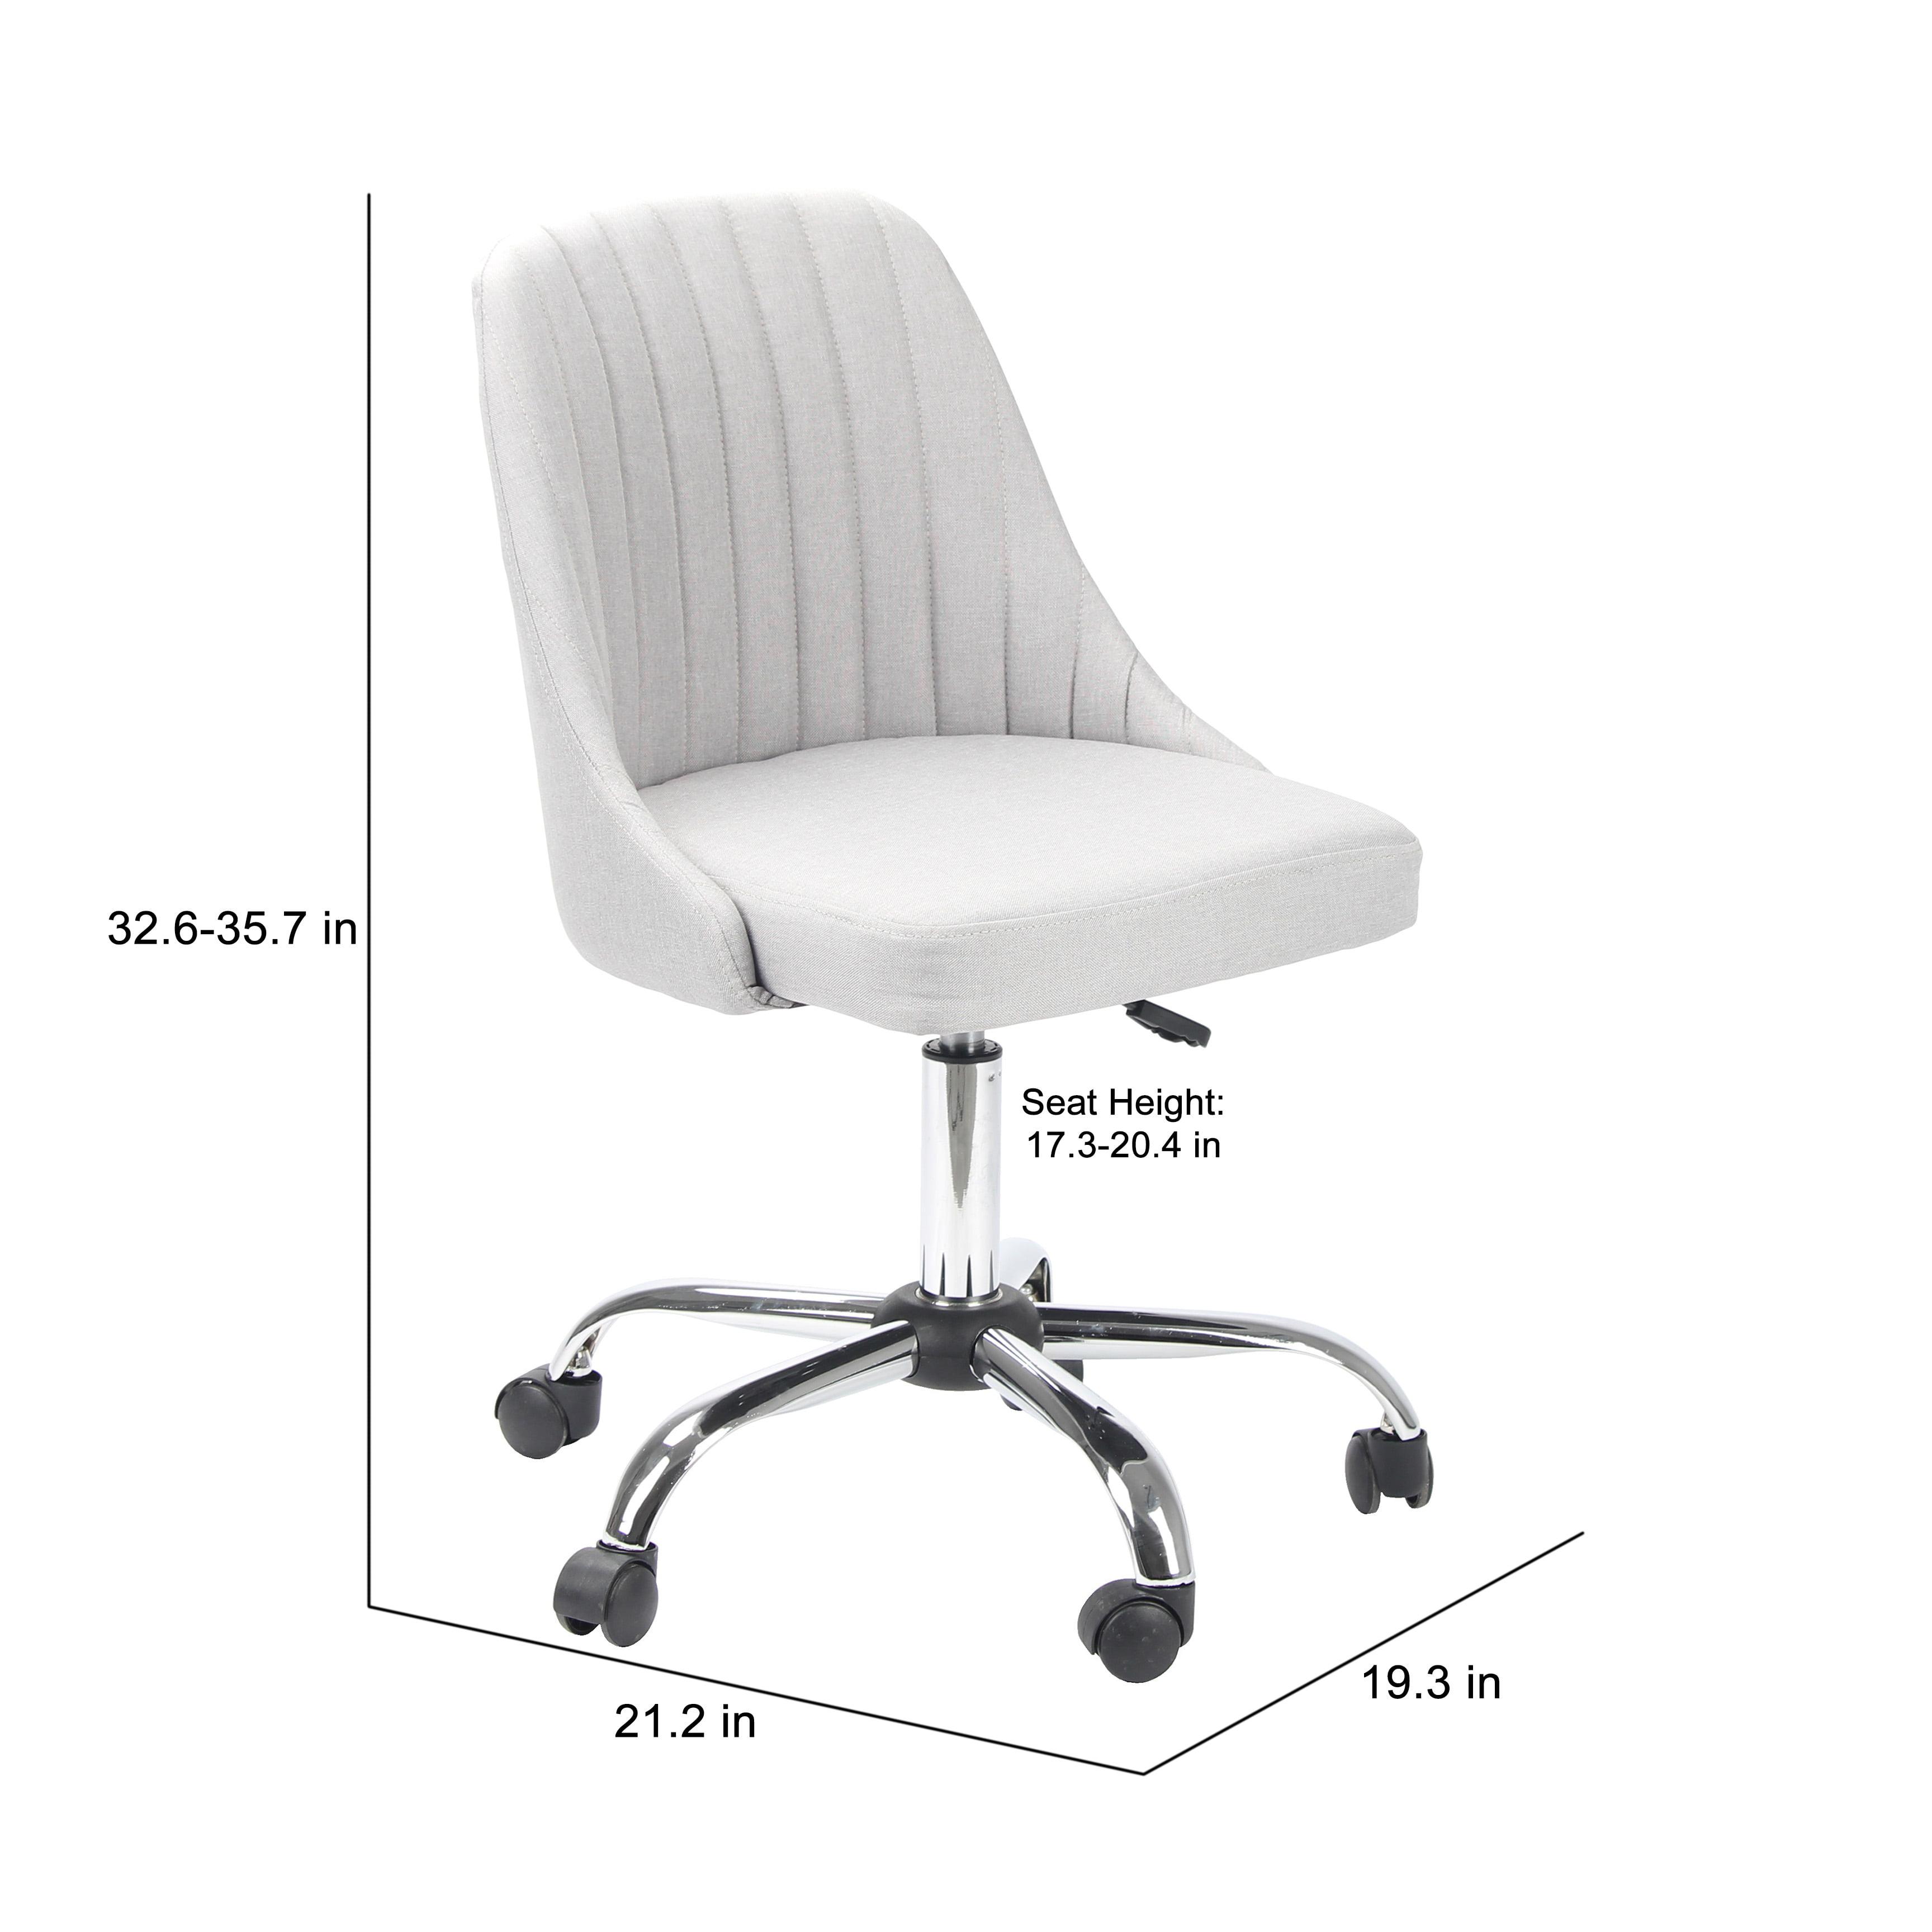 Porthos Home Office Chair Designer Office Chairs With Wheels Stylish Fabric Upholstery Premium Quality Comfort Ergonomic Lumbar Support Height Adjustable 360 Degree Swivel Walmart Com Walmart Com